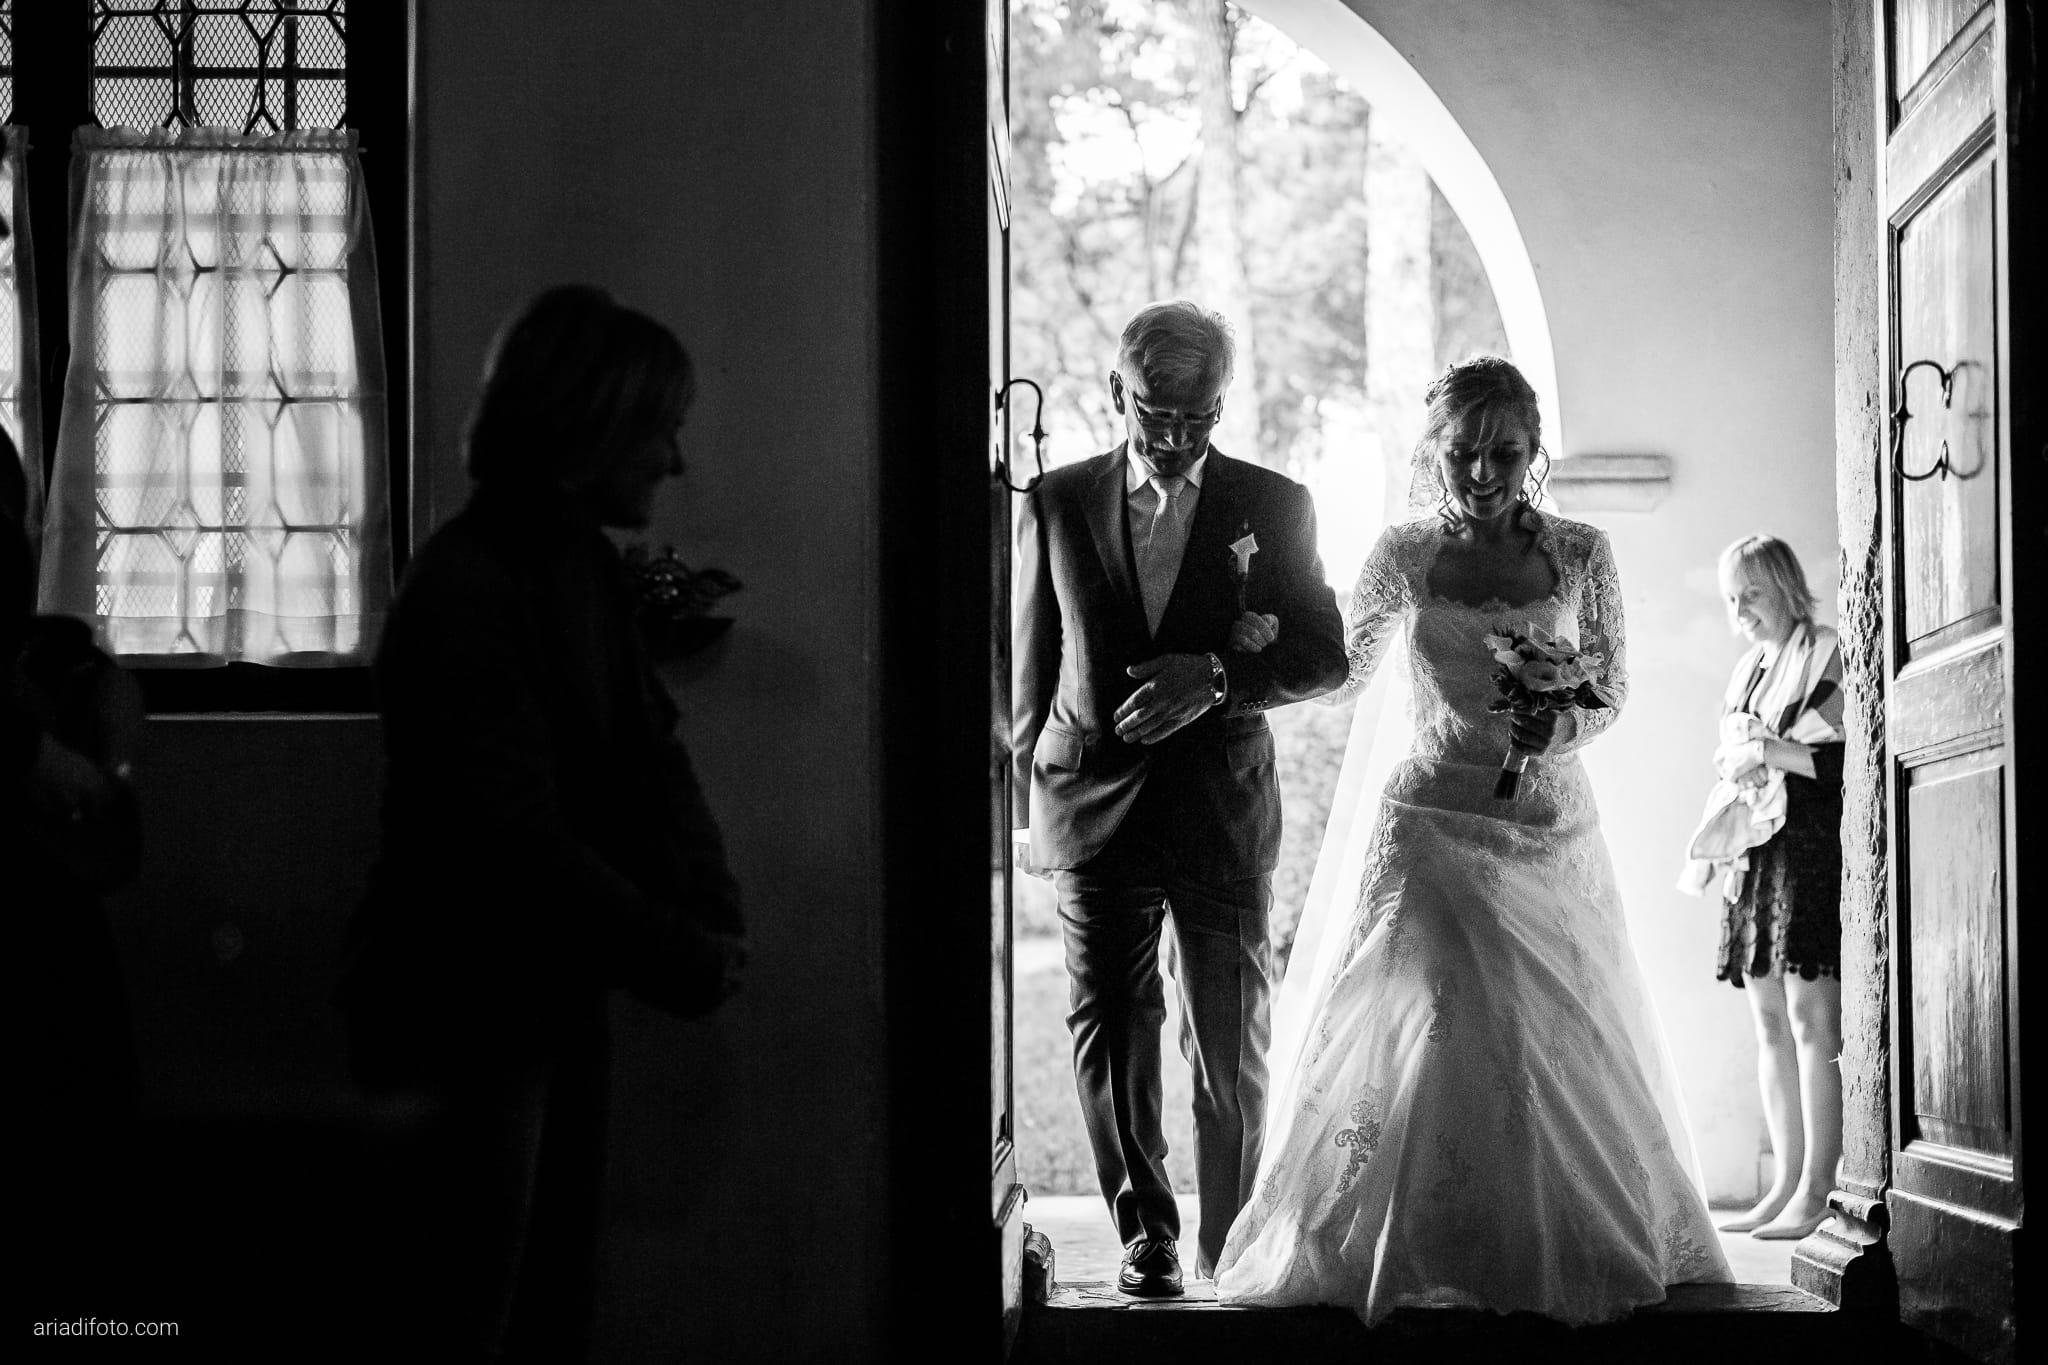 Eleonora Elia Matrimonio Chiesa Santa Eufemia Tarcento Udine Baronesse Tacco Gorizia cerimonia ingresso sposa